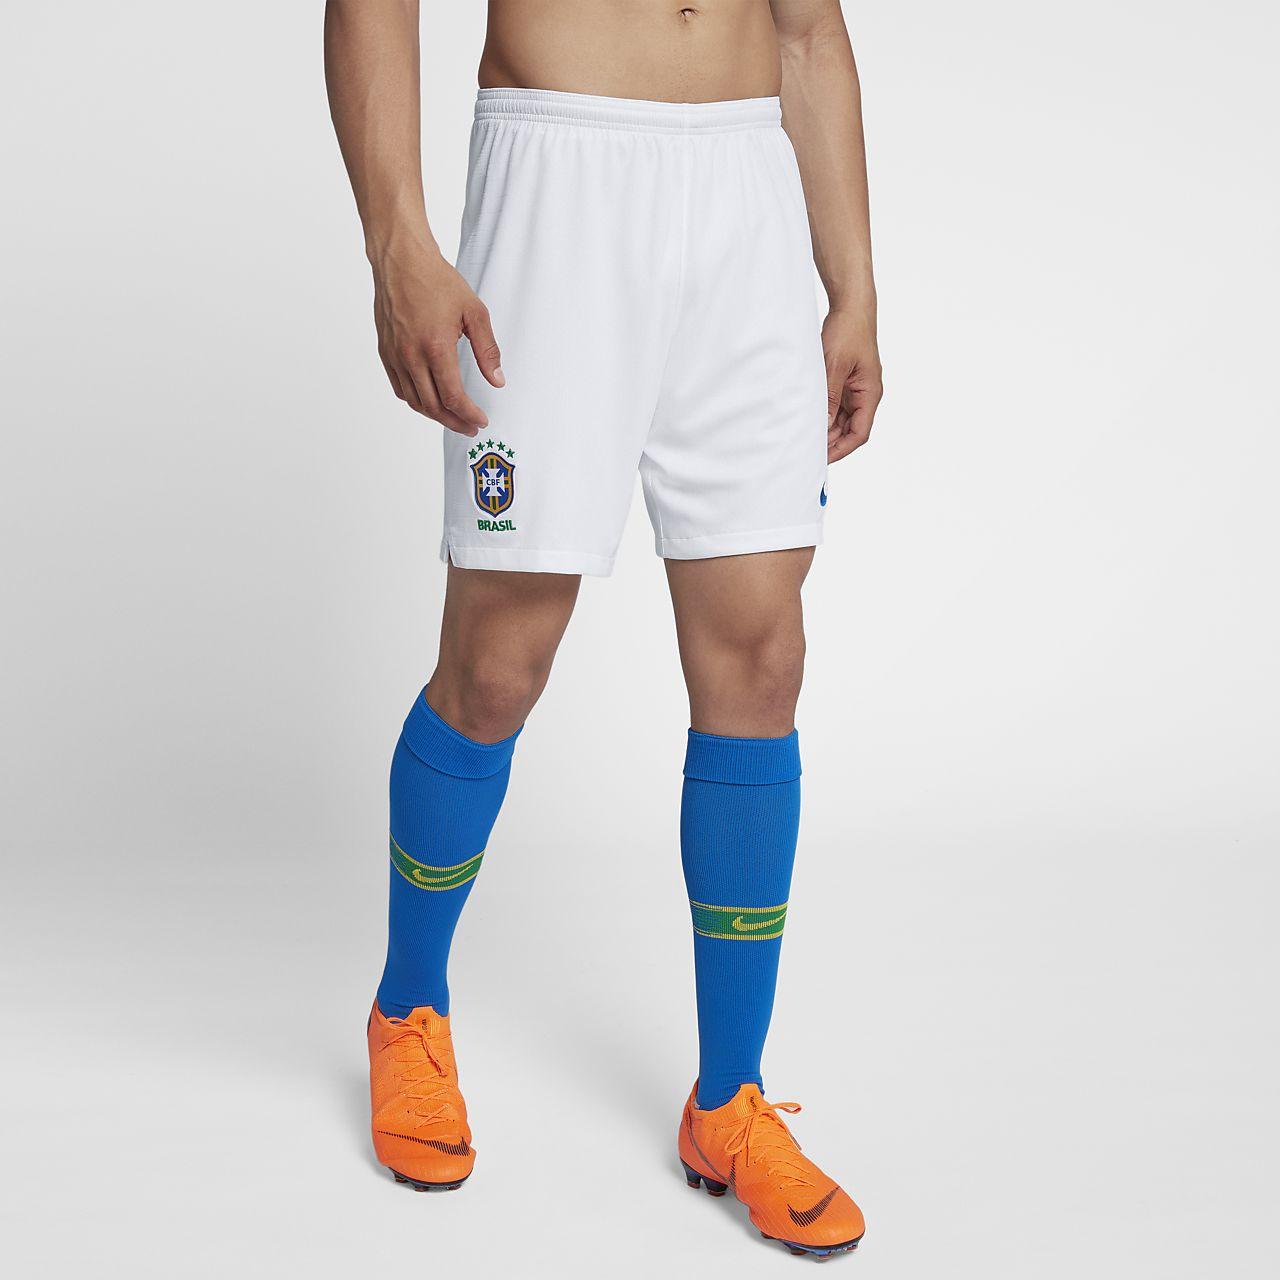 2018 Brasil CBF Stadium Away Pantalons curts de futbol - Home